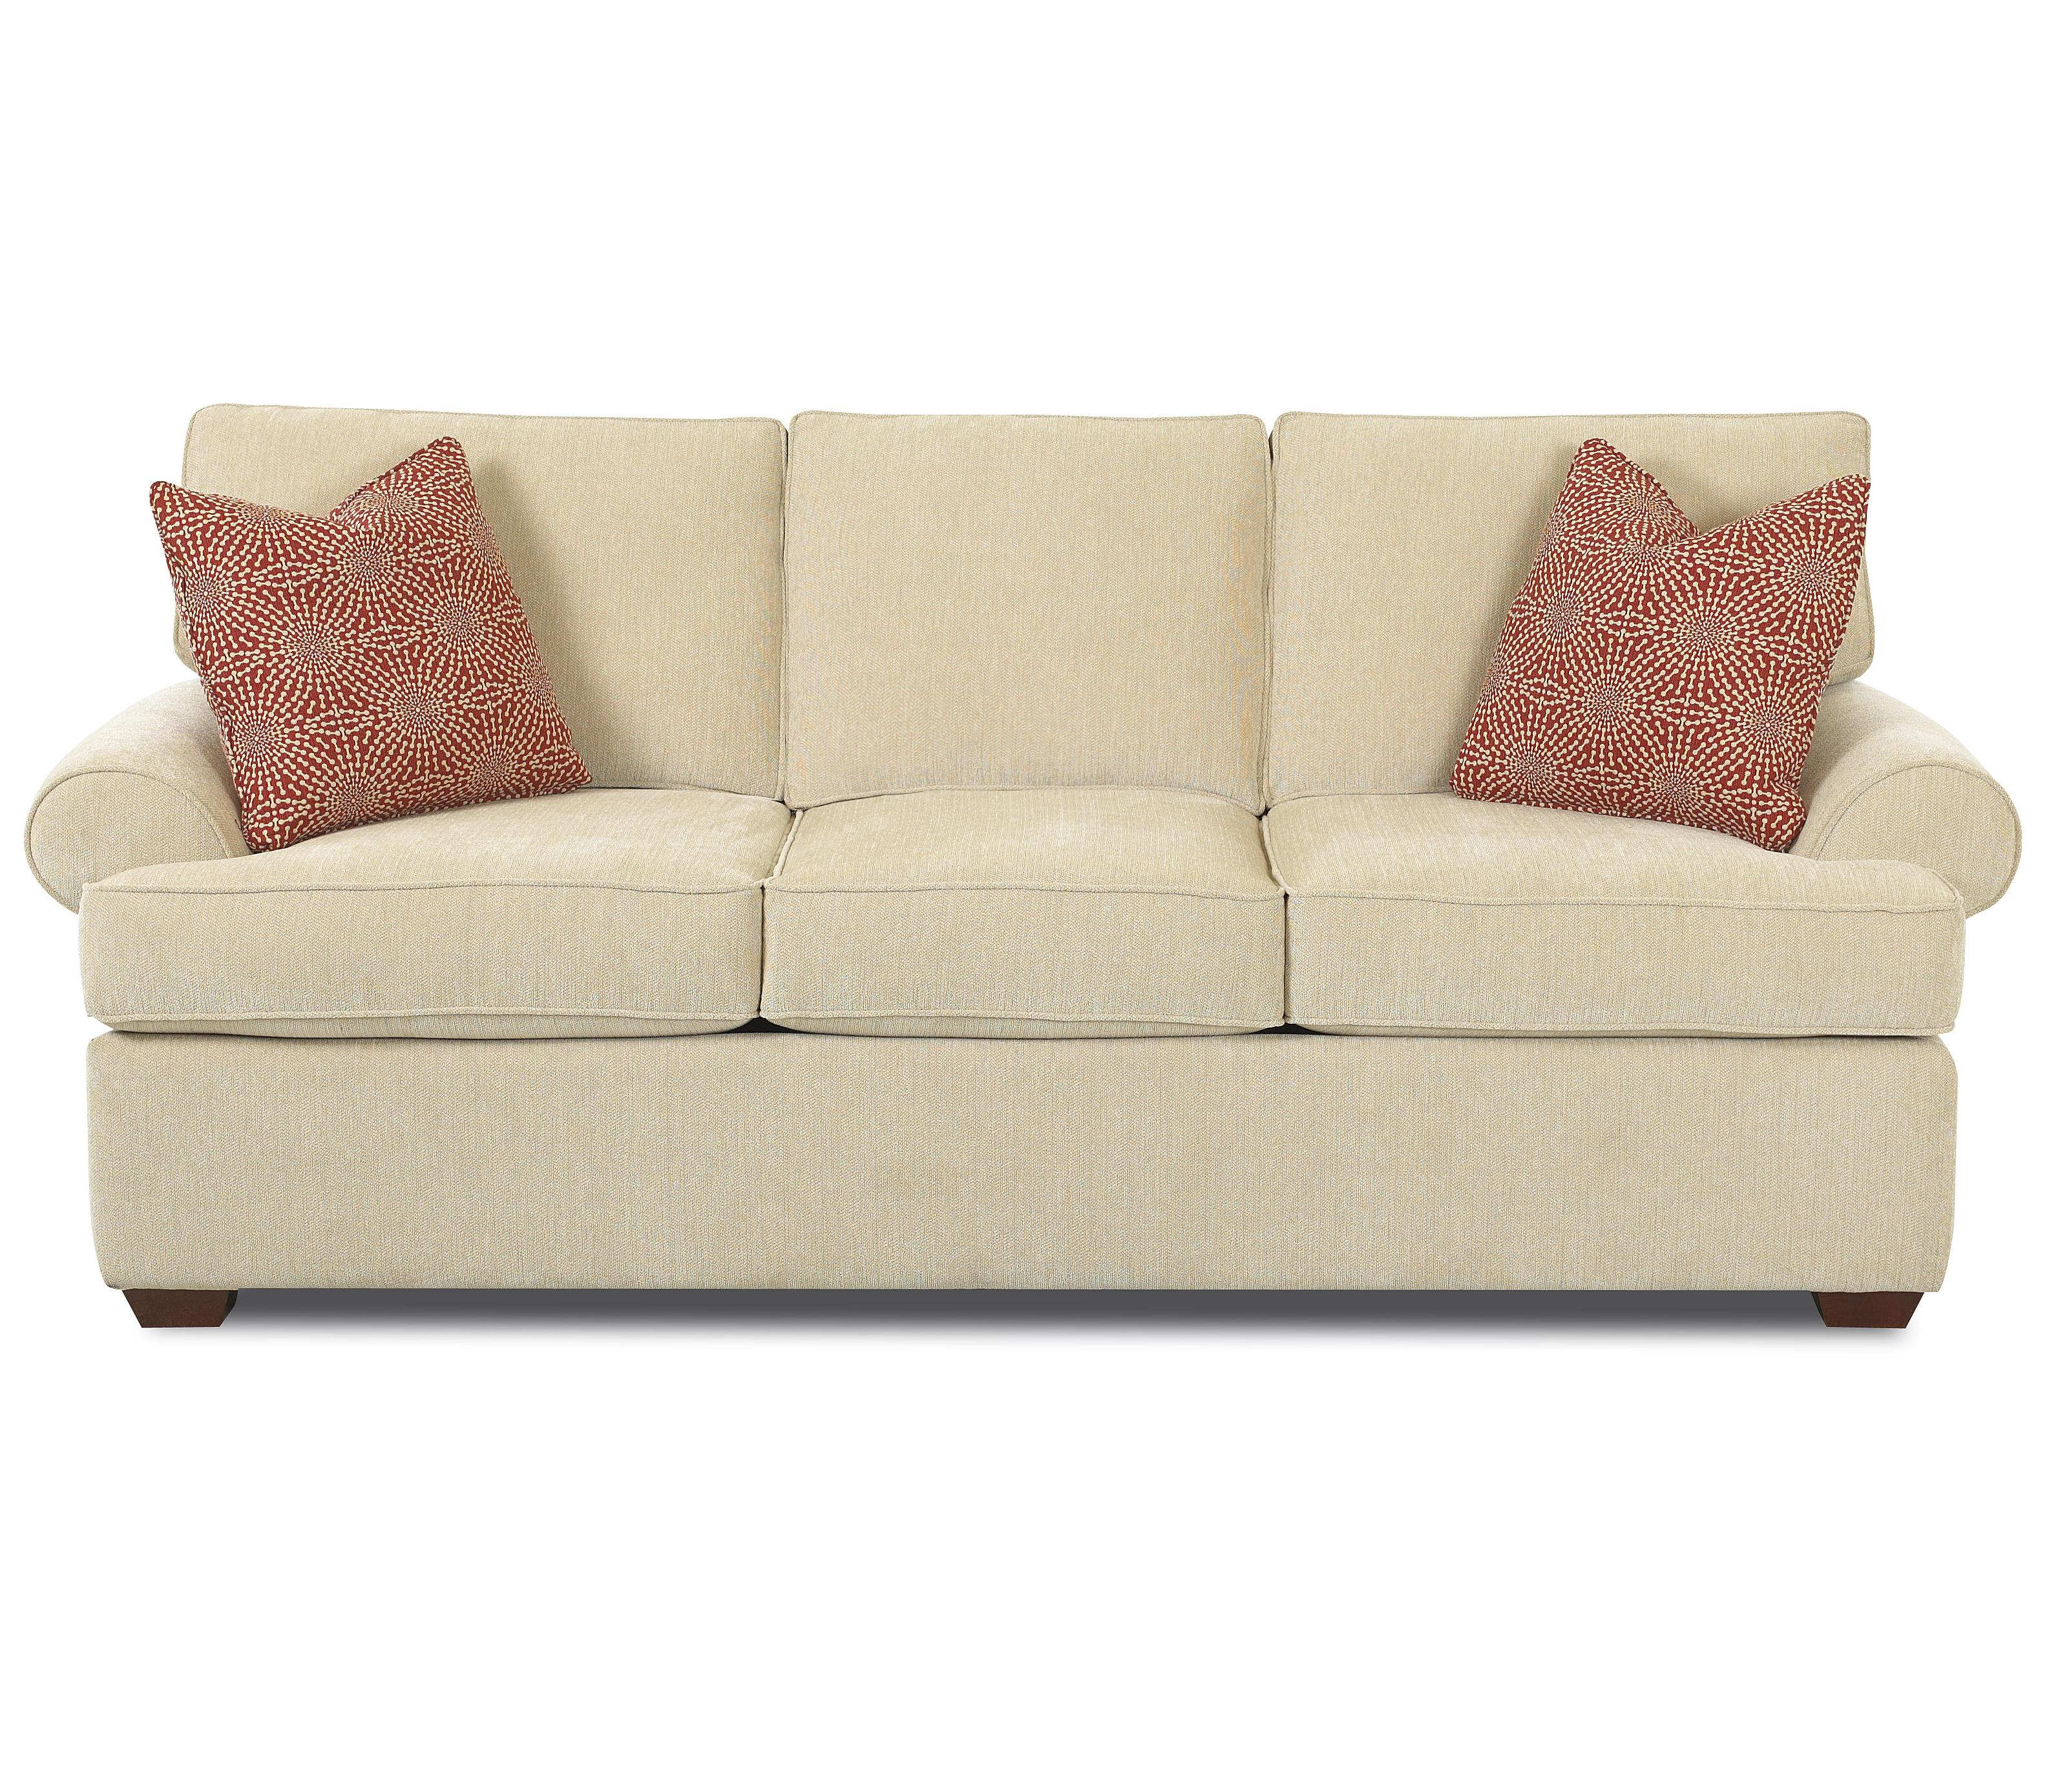 Belfort Basics Choices Custom Upholstery Sofa - Item Number: K51360 S